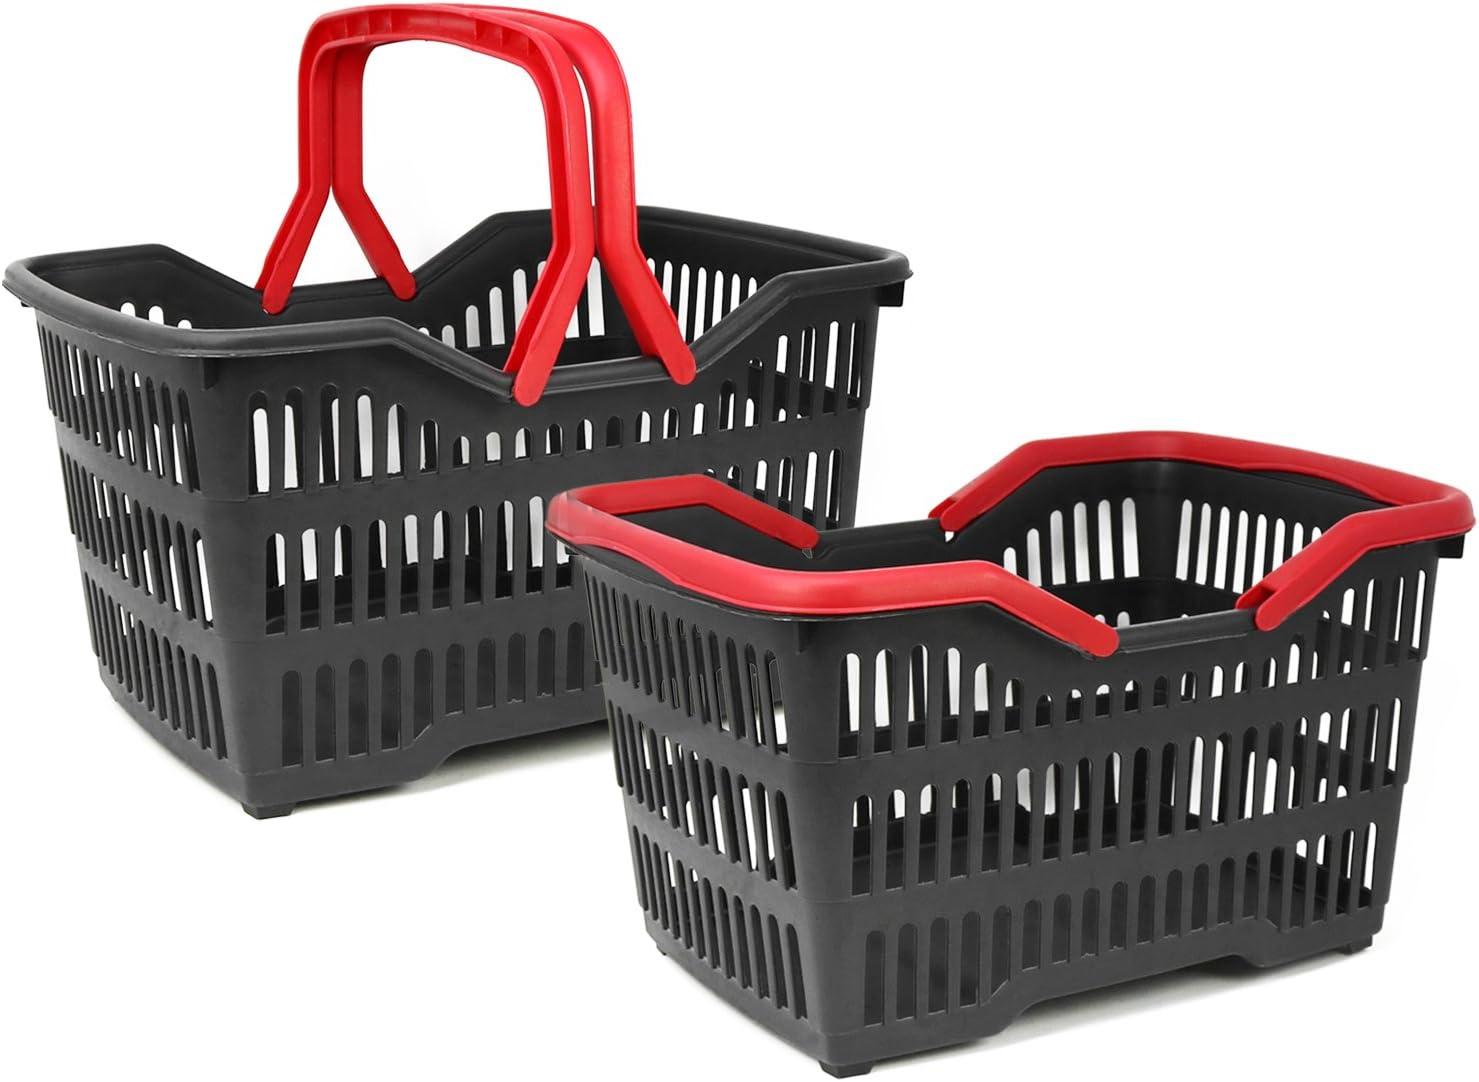 Cesta de pl/ástico Resistente en Negro//Rojo com-four/® Cesta de Compras con Asas de Transporte 001 Piezas - Negro//Rojo 39.5 x 29 x 22.5 cm